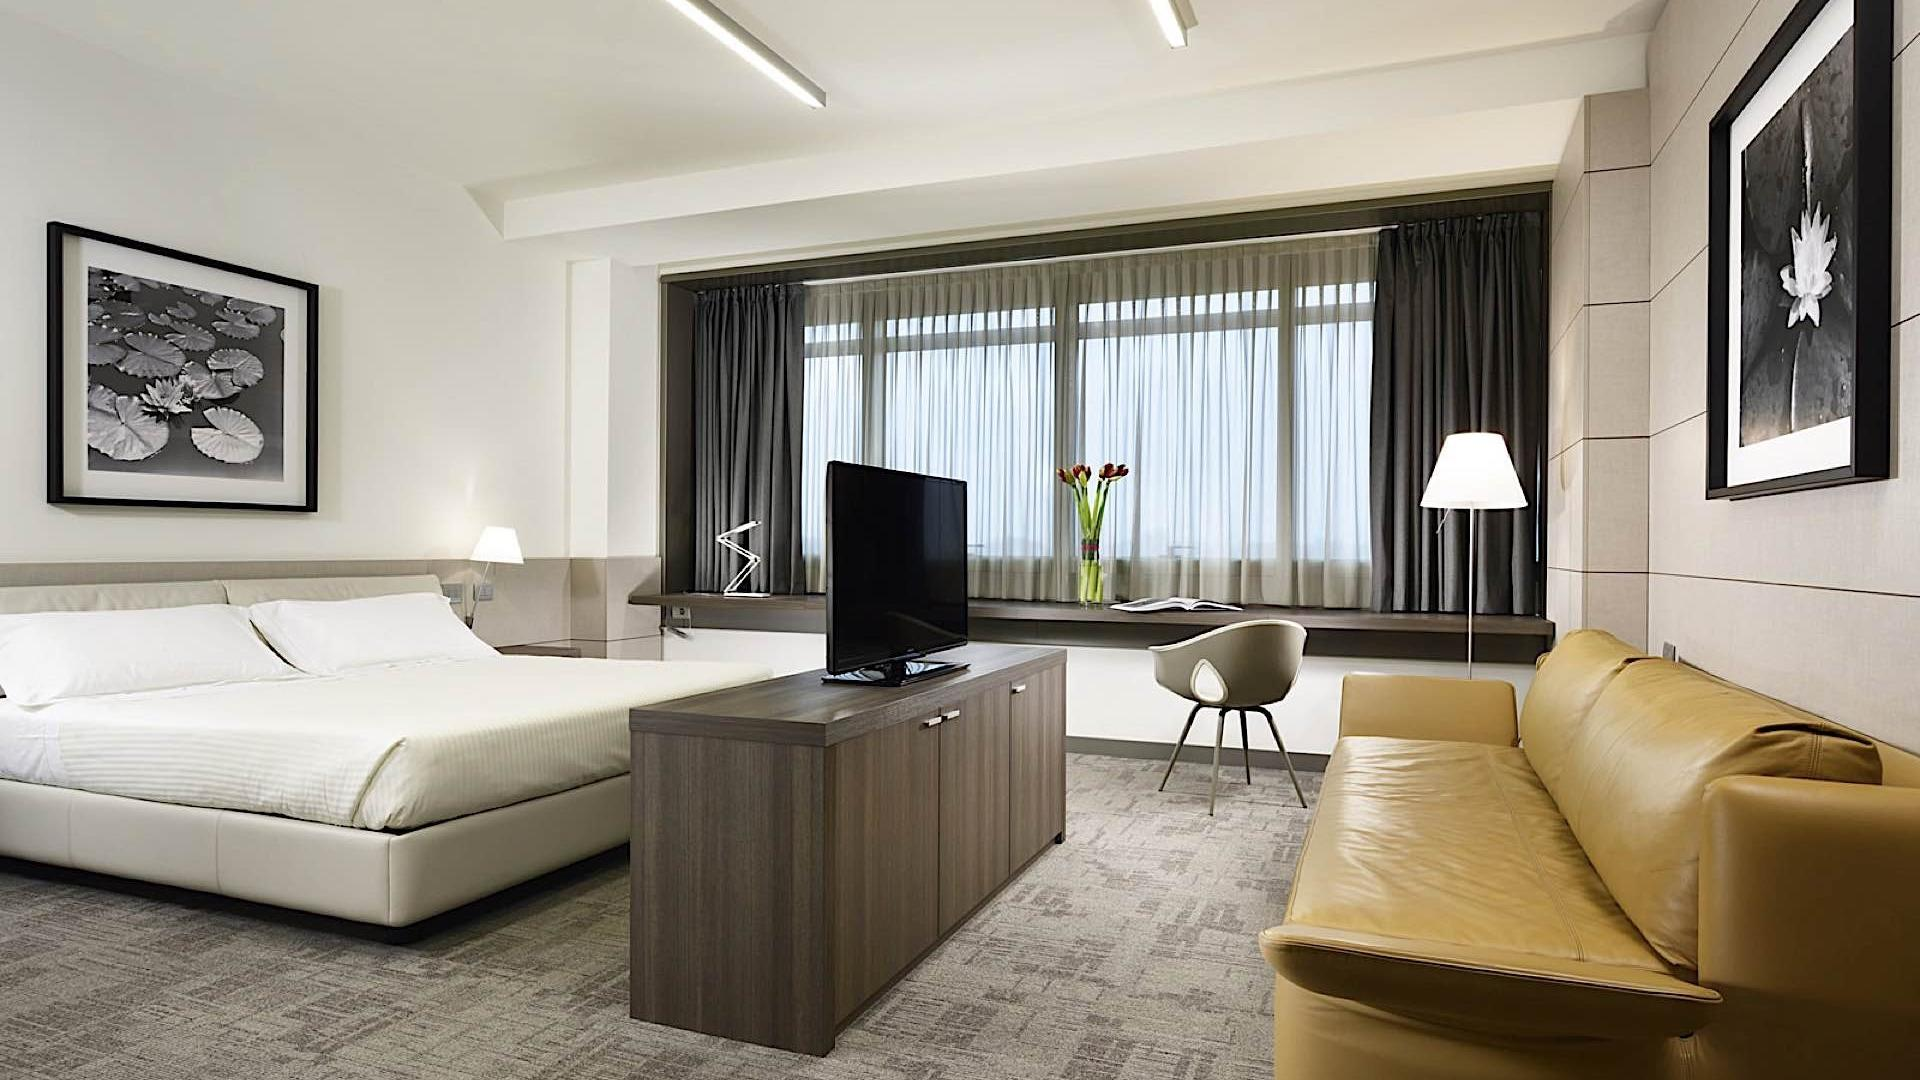 Room | San Vitale Bologna